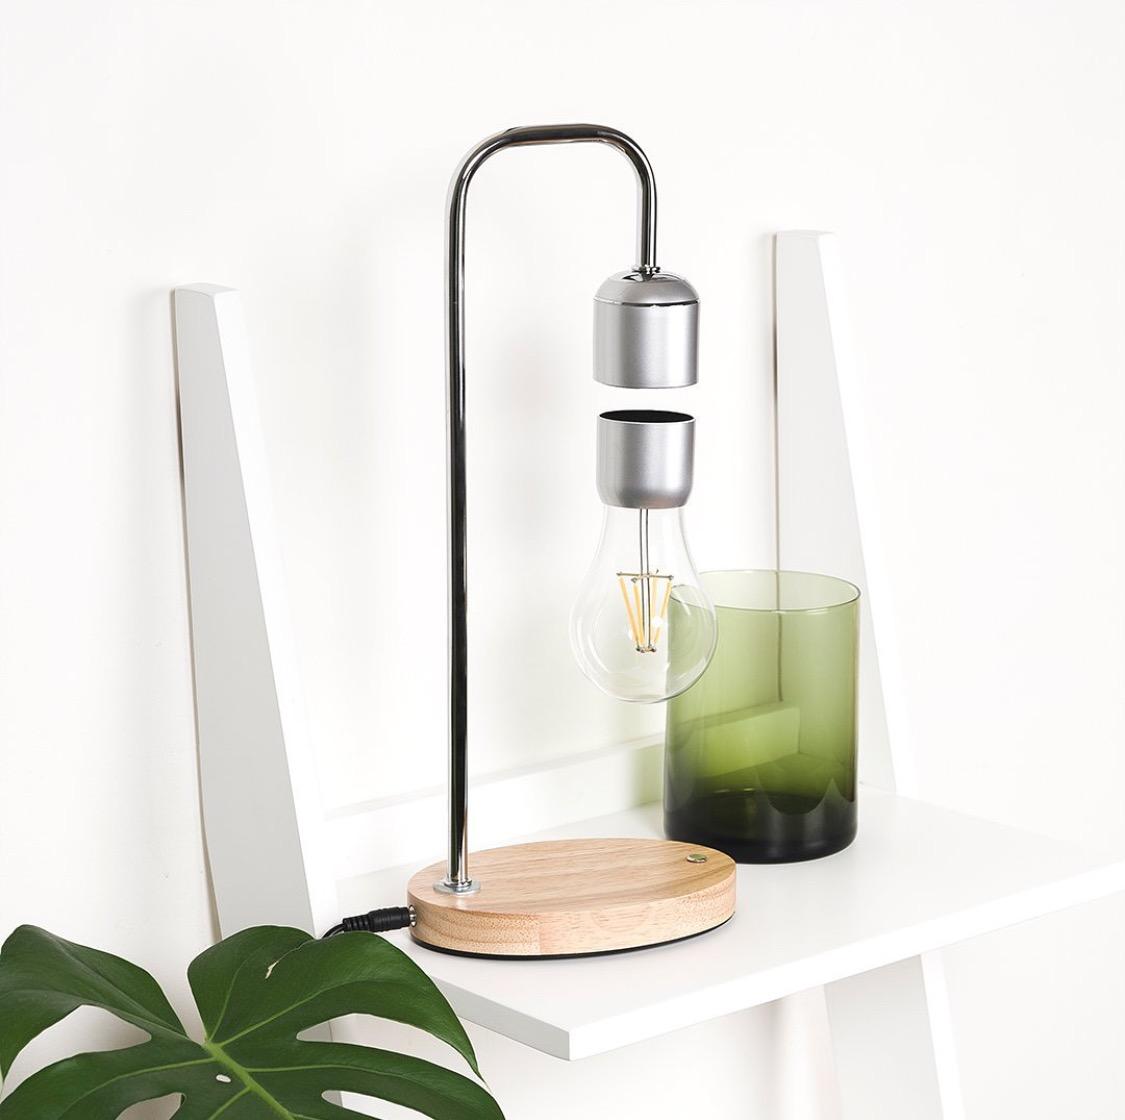 The mini floating lamp